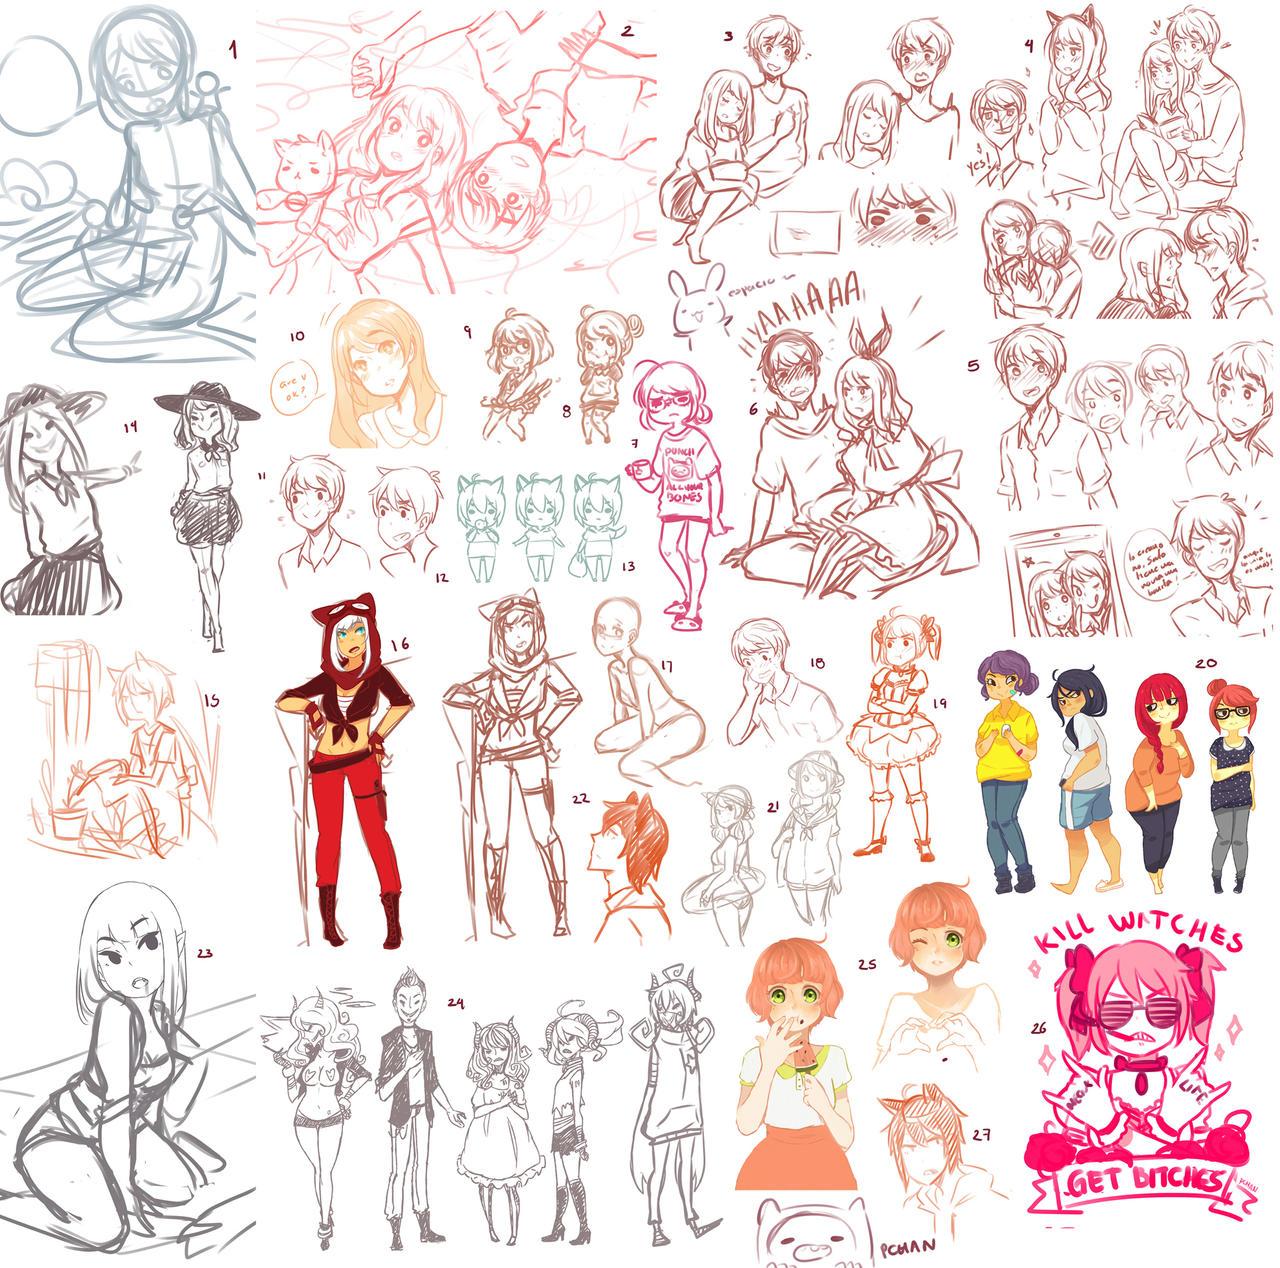 Sketch dump by AkatsukiZakuro